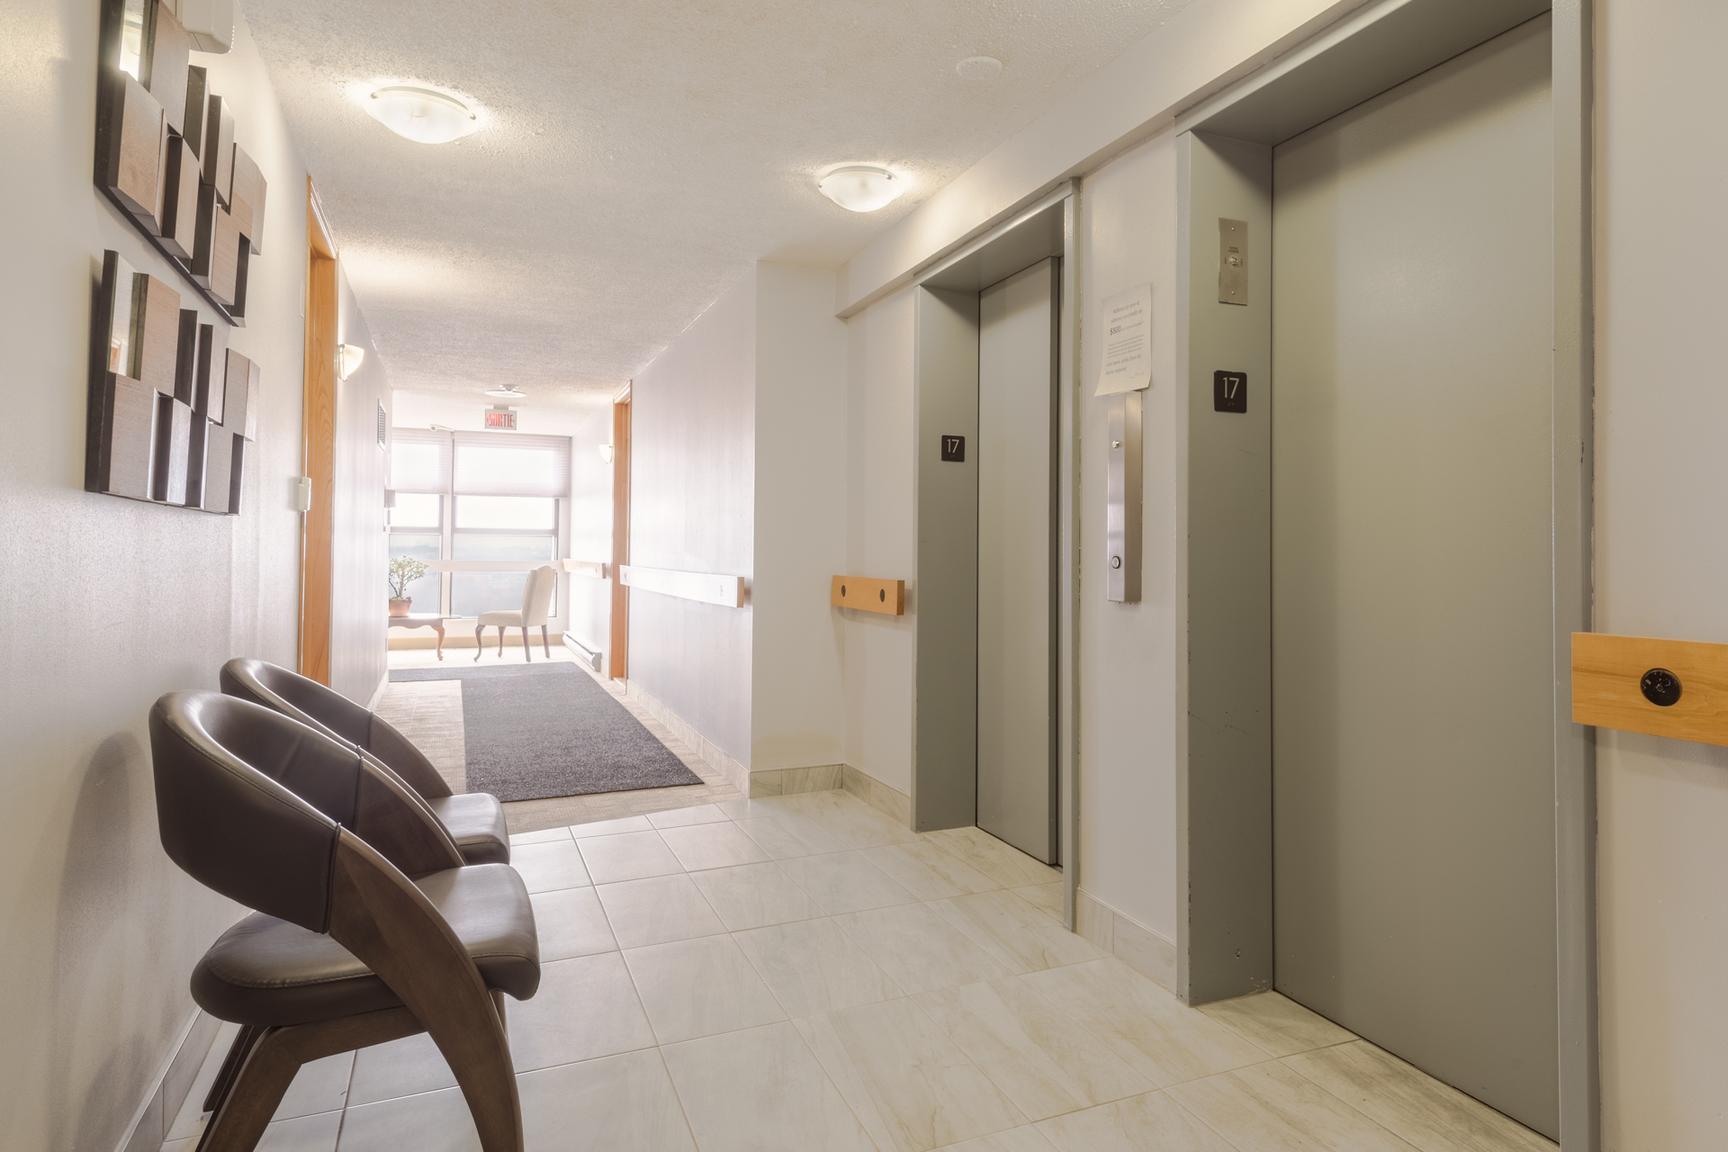 2 bedroom Apartments for rent in Laval at Le Quatre Cent - Photo 28 - RentQuebecApartments – L407185